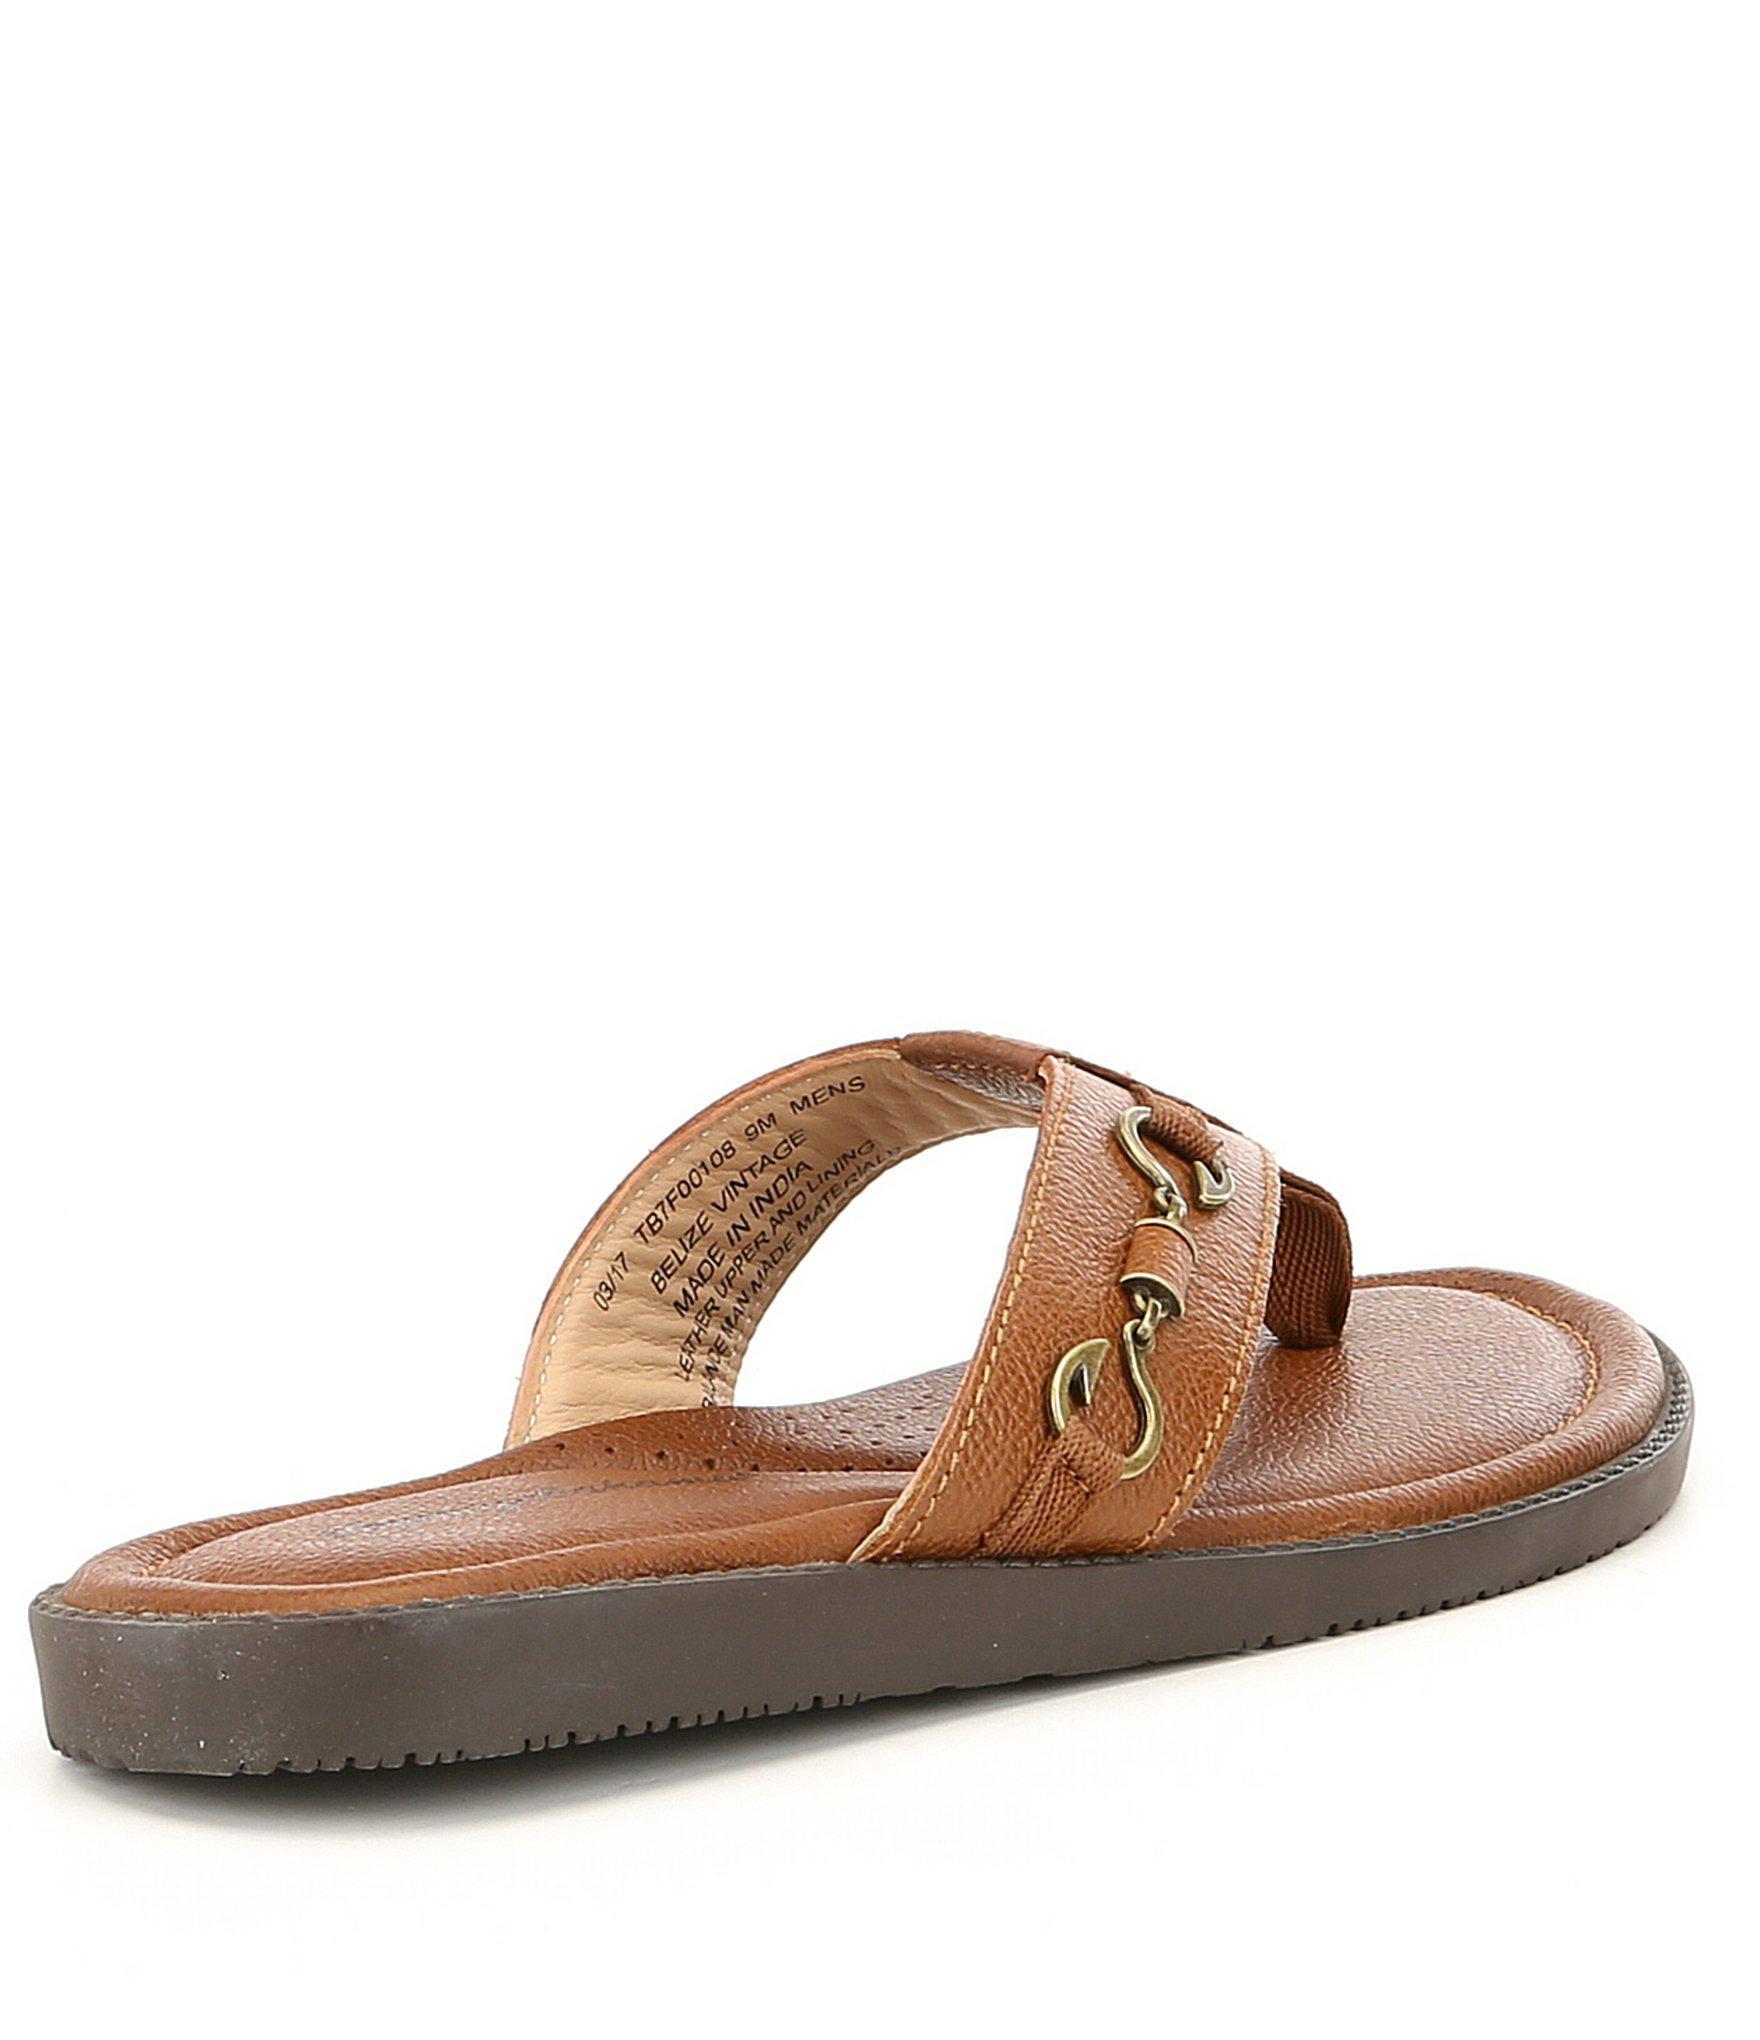 f6c574cca Tommy Bahama - Brown Men ́s Belize Vintage Sandals for Men - Lyst. View  fullscreen